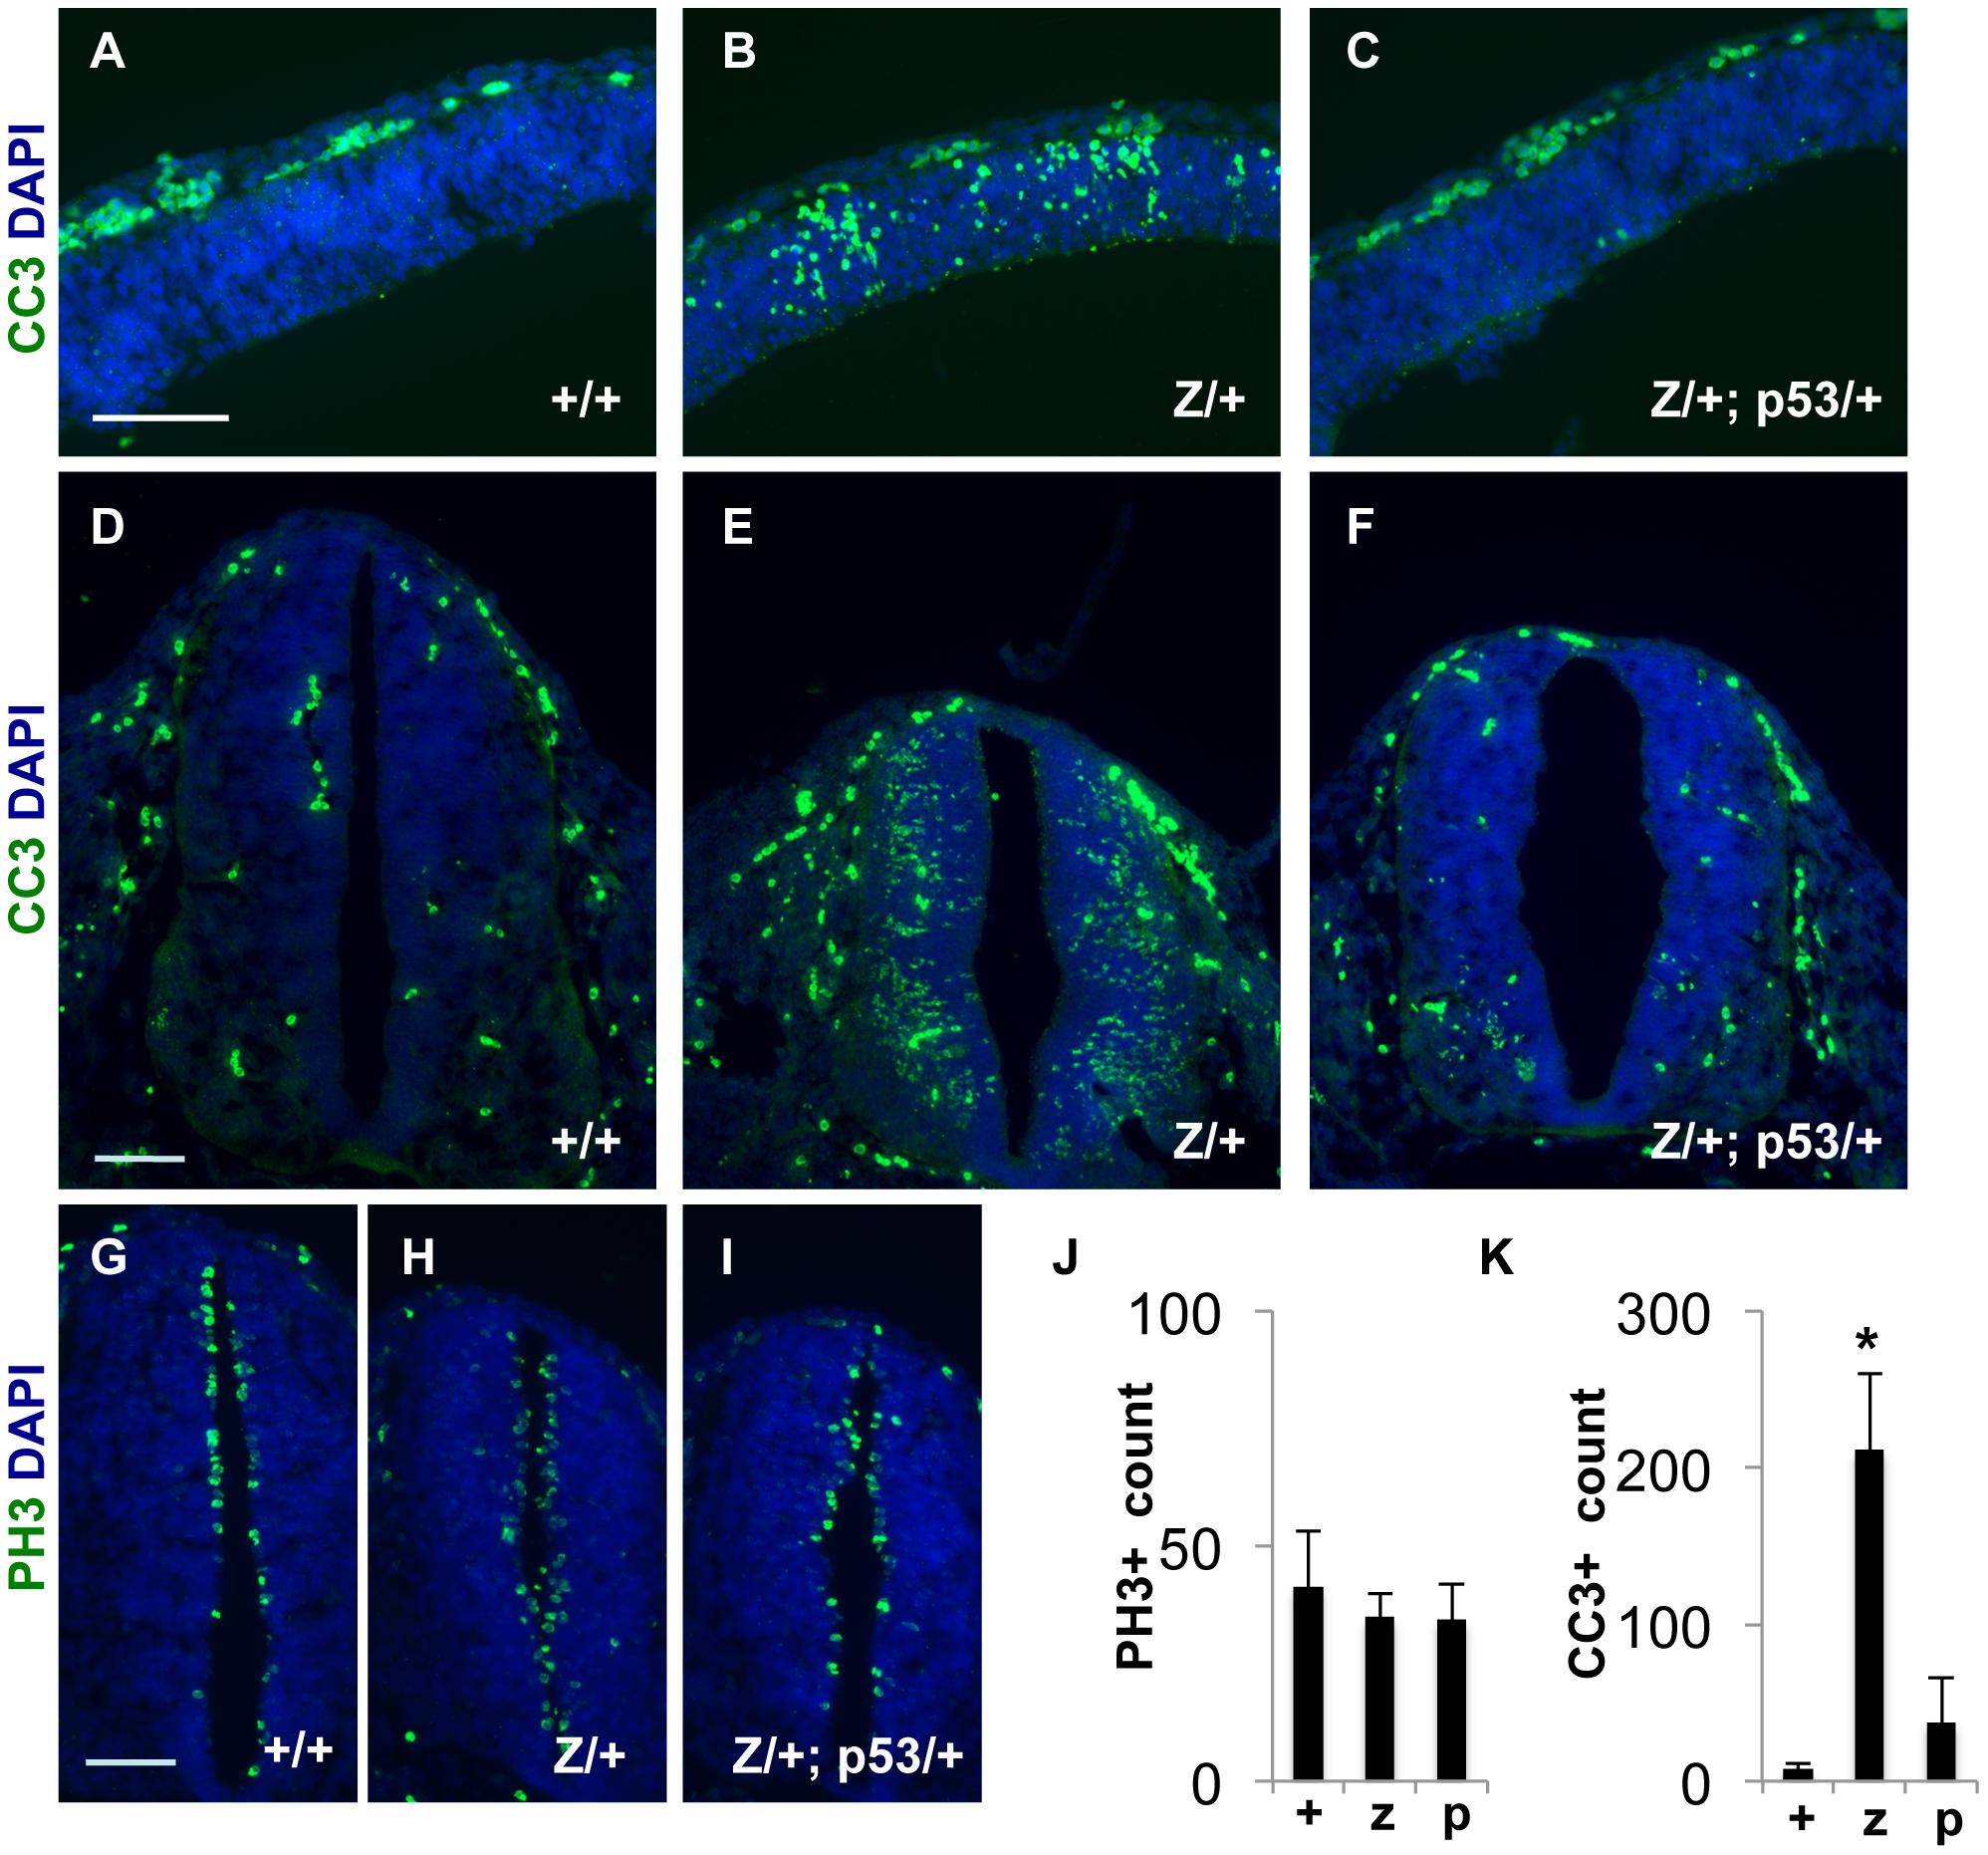 Increased apoptosis occurs in the developing CNS of <i>Rps7<sup>Zma</sup>/+</i> mutant embryos; however, this apoptosis is reduced in <i>Rps7<sup>Zma</sup>/+</i>; <i>Trp53<sup>KO</sup>/+</i> embryos.